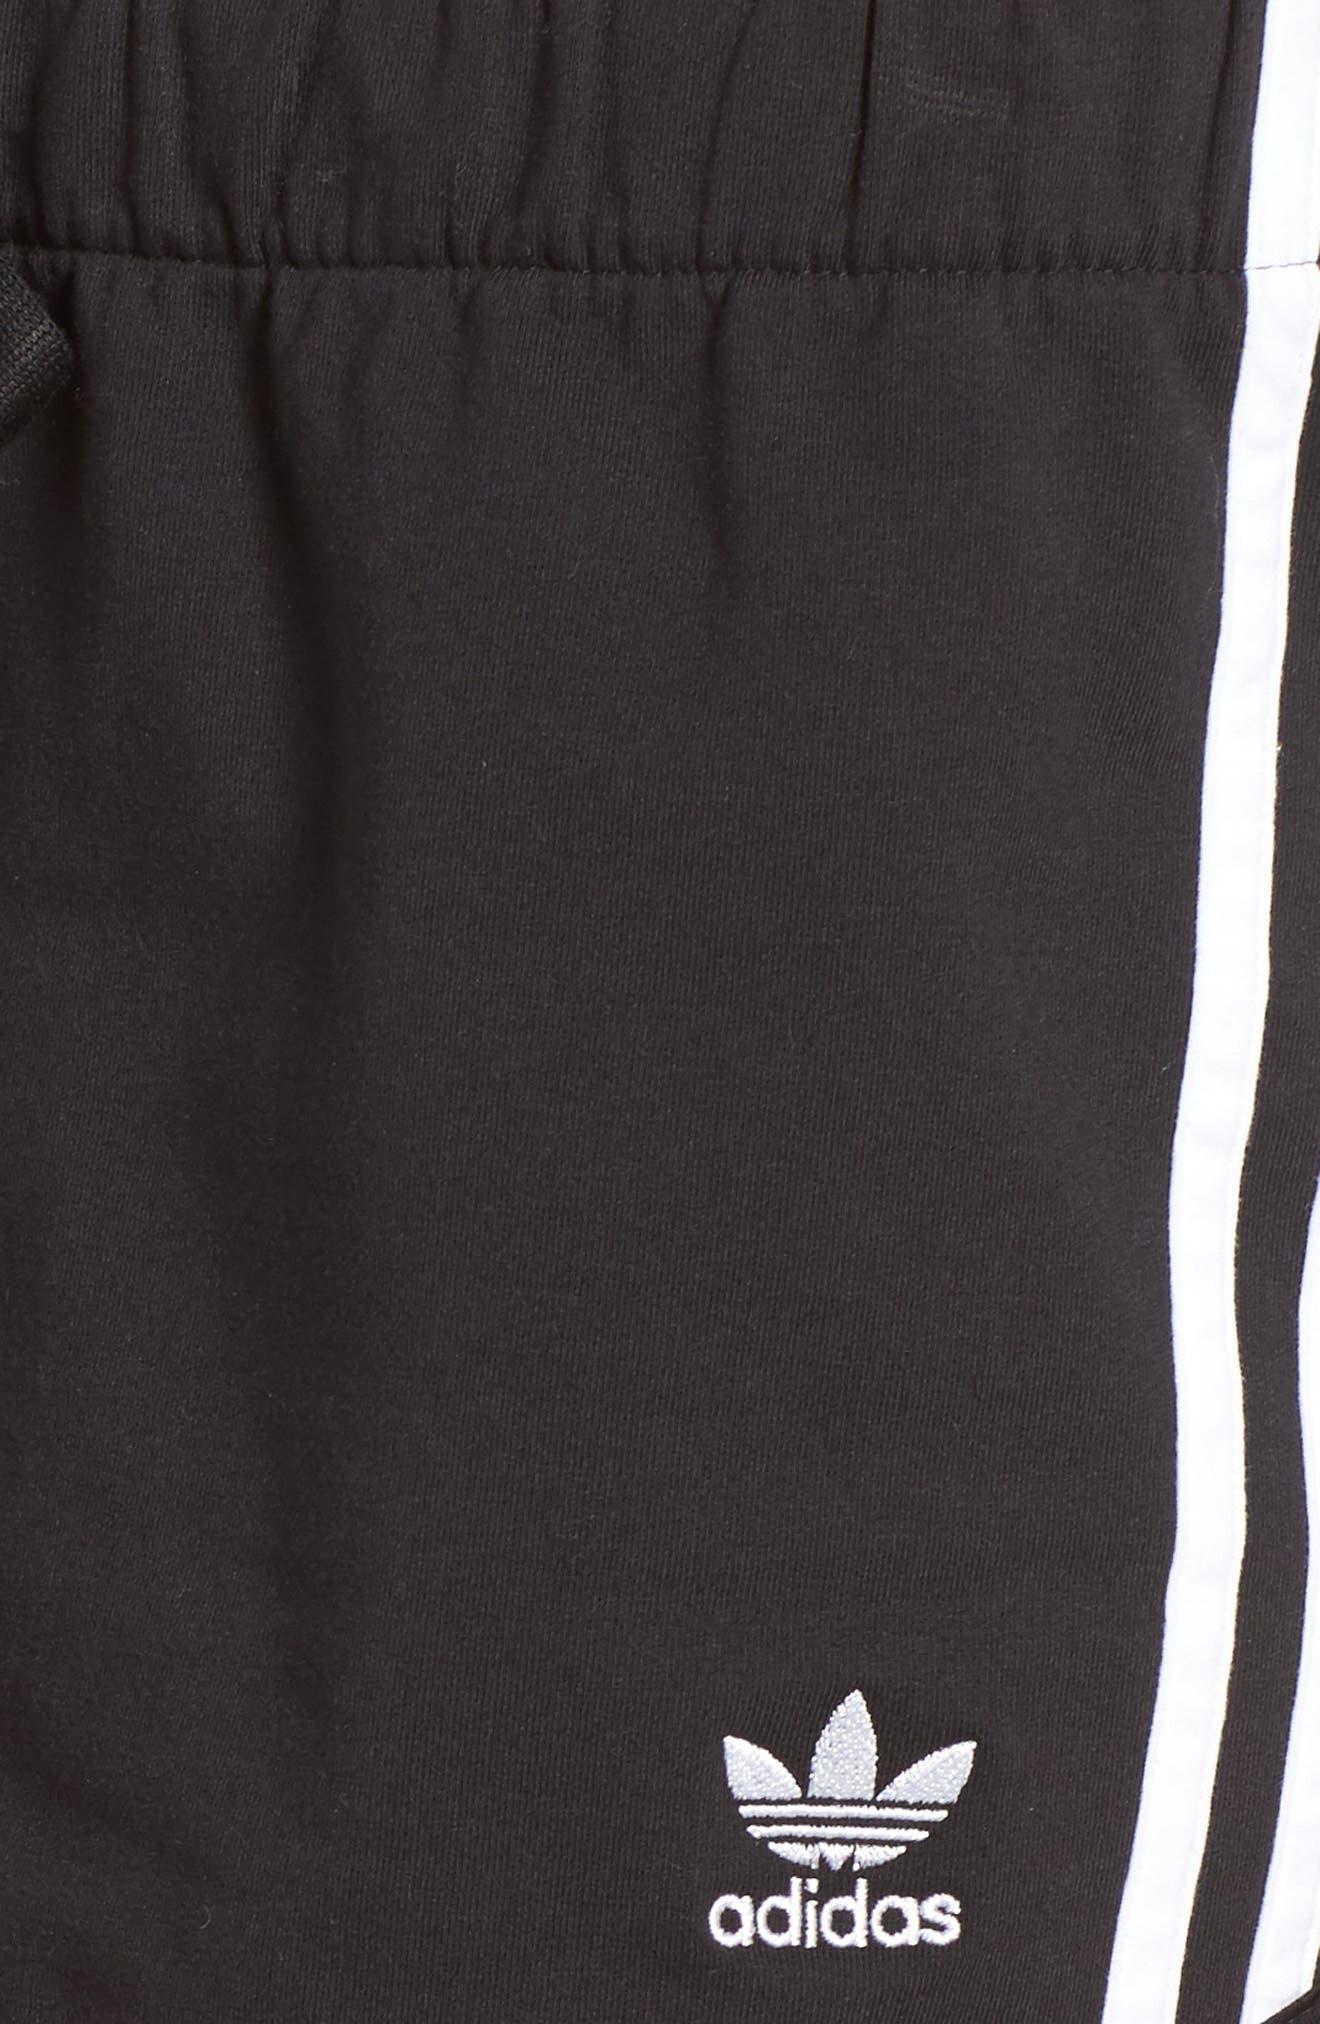 Originals Slim Fit Shorts,                             Alternate thumbnail 5, color,                             001